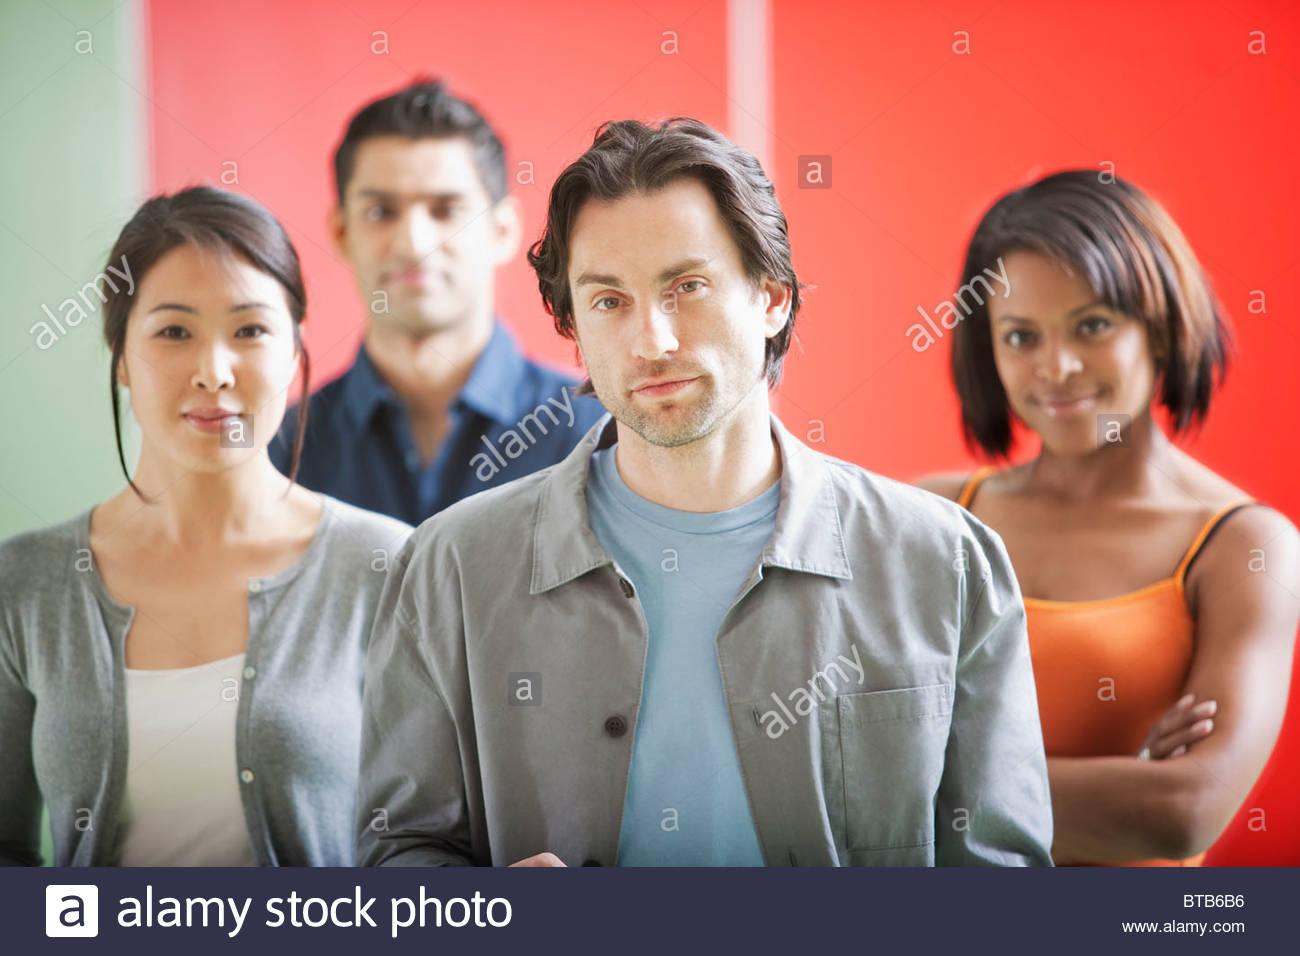 Confident men and women - Stock Image